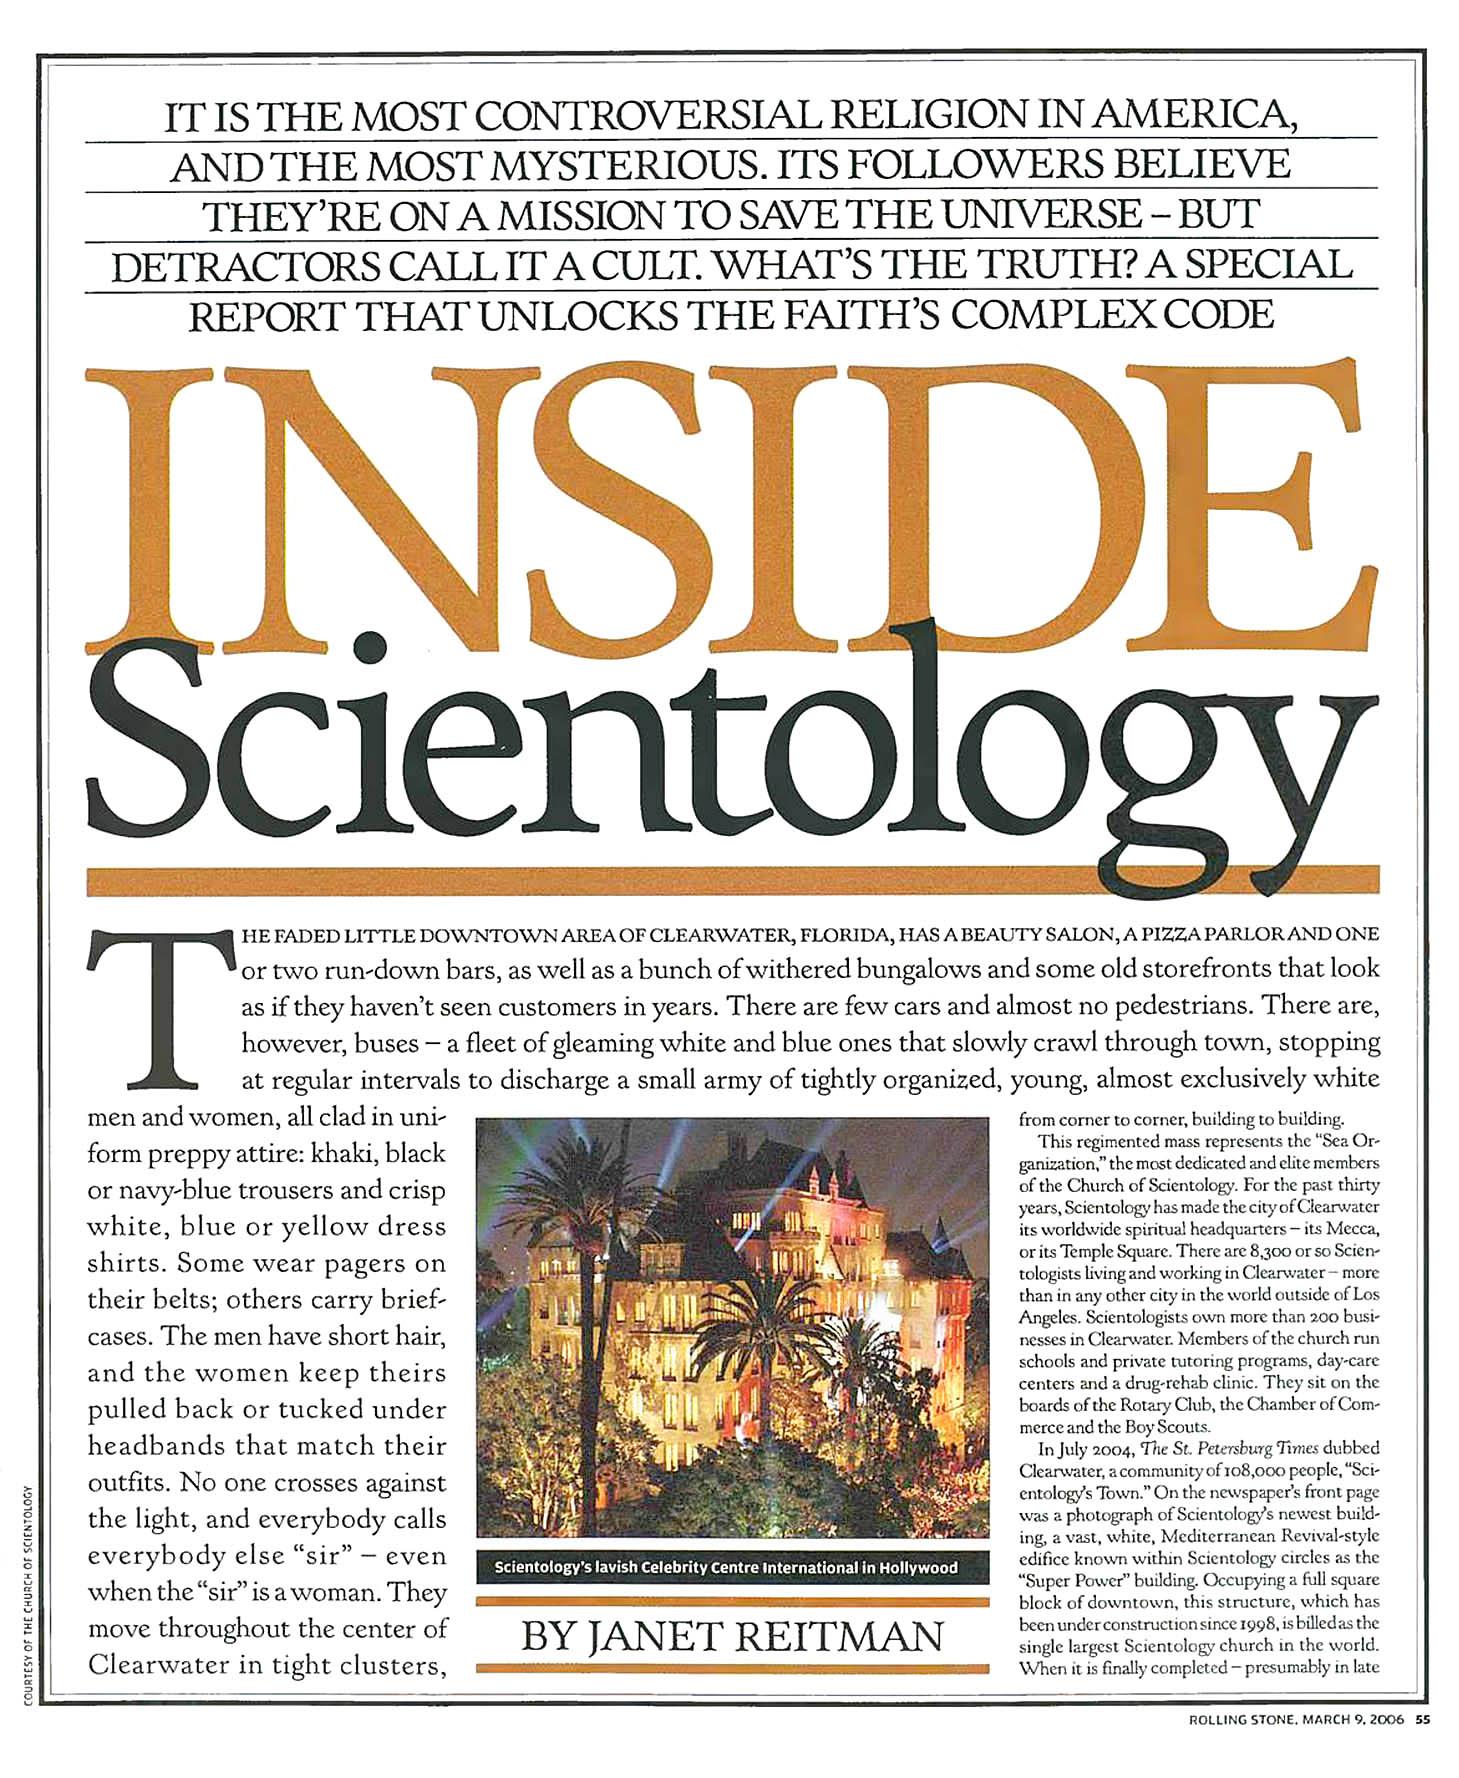 RS 060309 Scientology 01.jpg